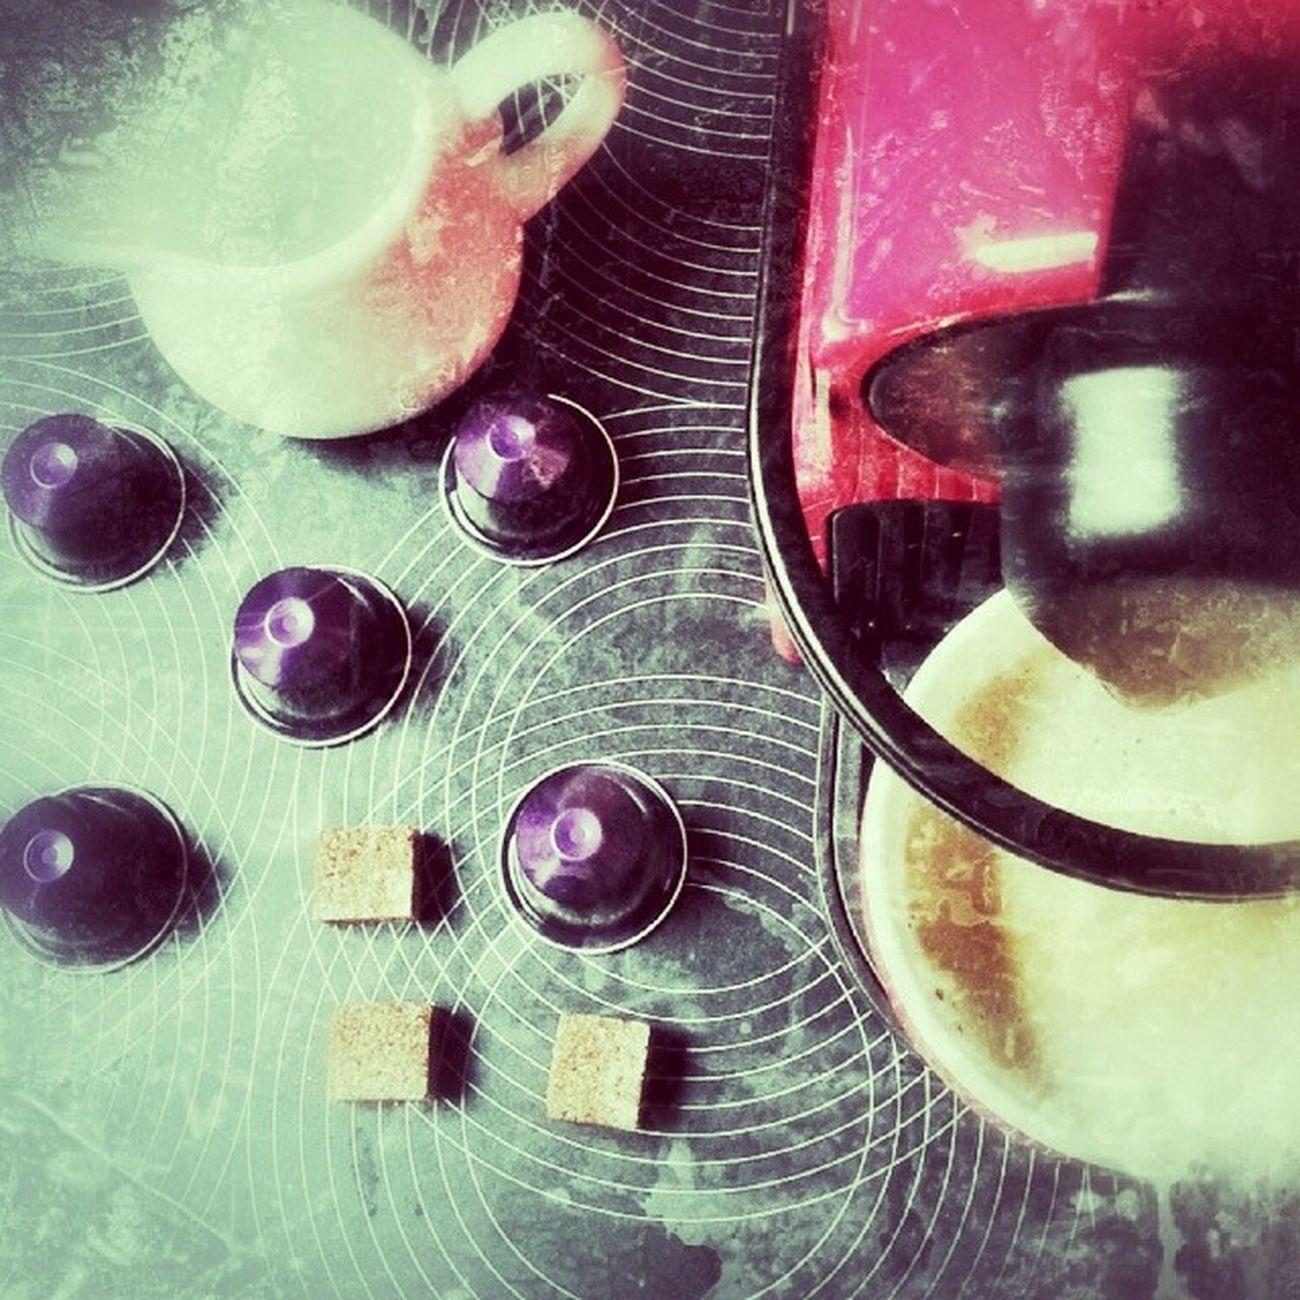 ? ON SUNDAY MORNING ? Coffeetime Nespressomoments Sugar Milk